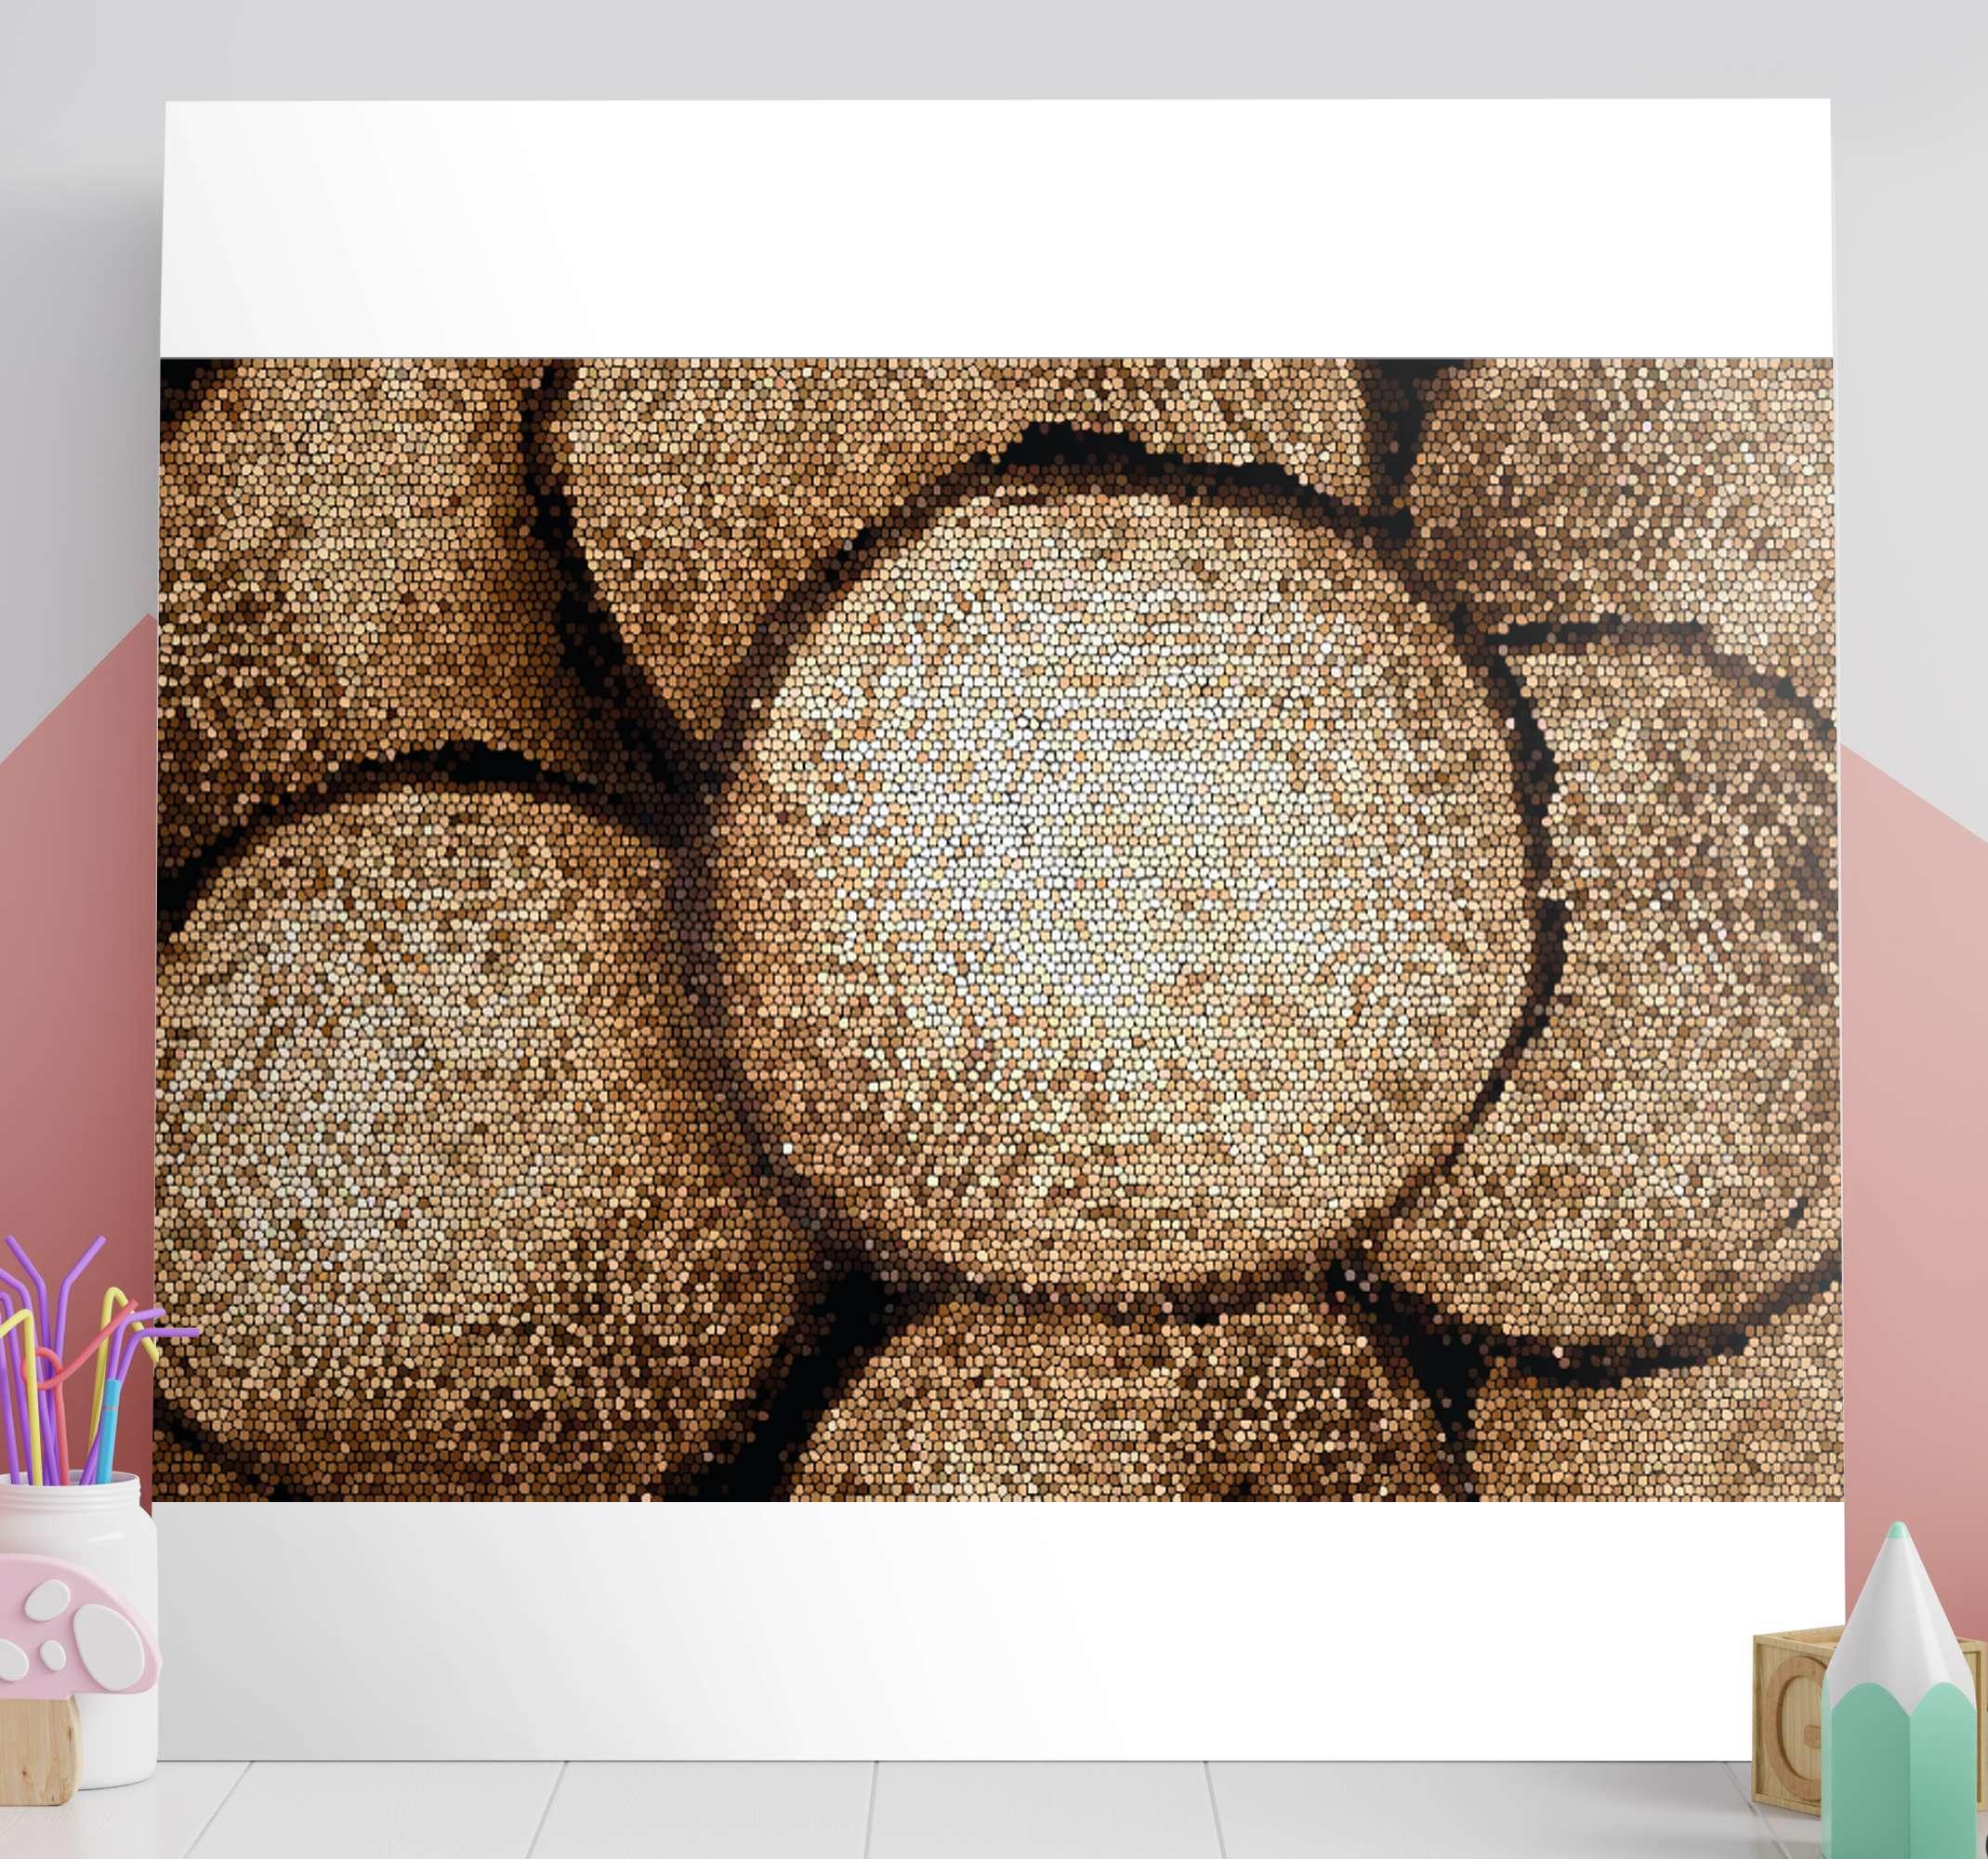 TenStickers. 木制方形照片马赛克画布. 完美的木质设计马赛克帆布印花,可为您的房屋墙壁装饰。立即注册,即可享受首次订单10%的优惠。